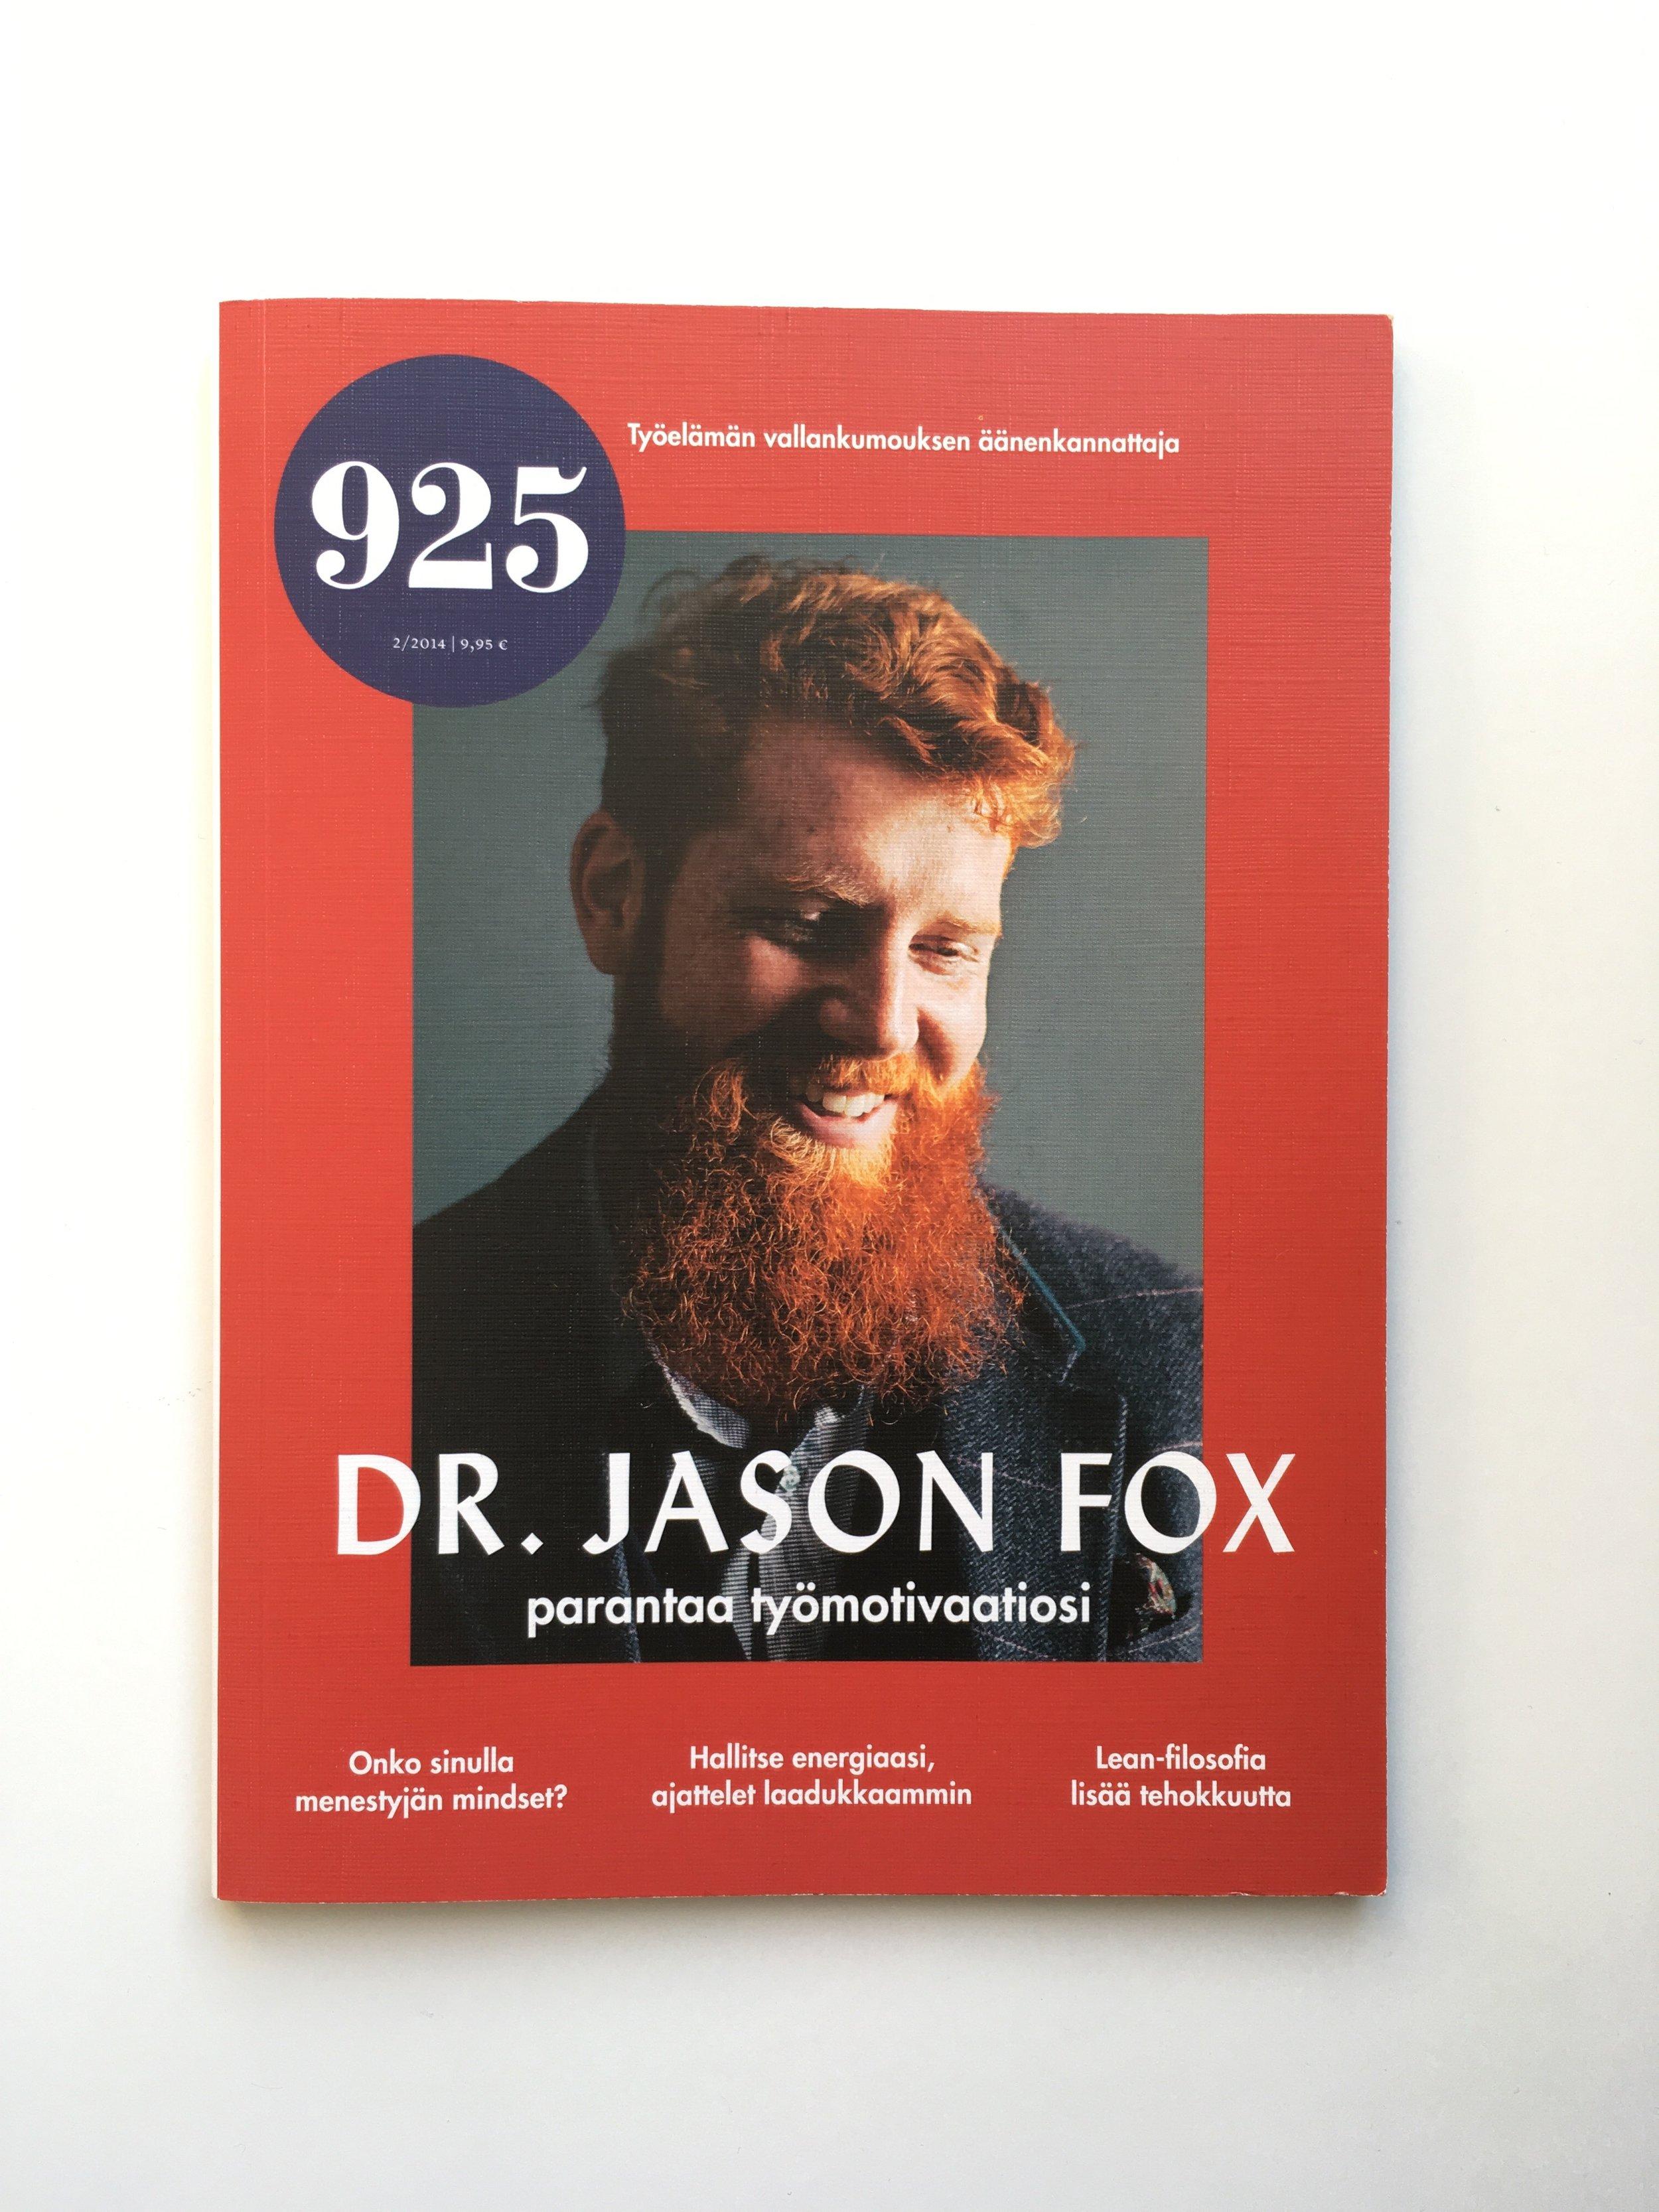 Dr Jason Fox motivational speaker and author